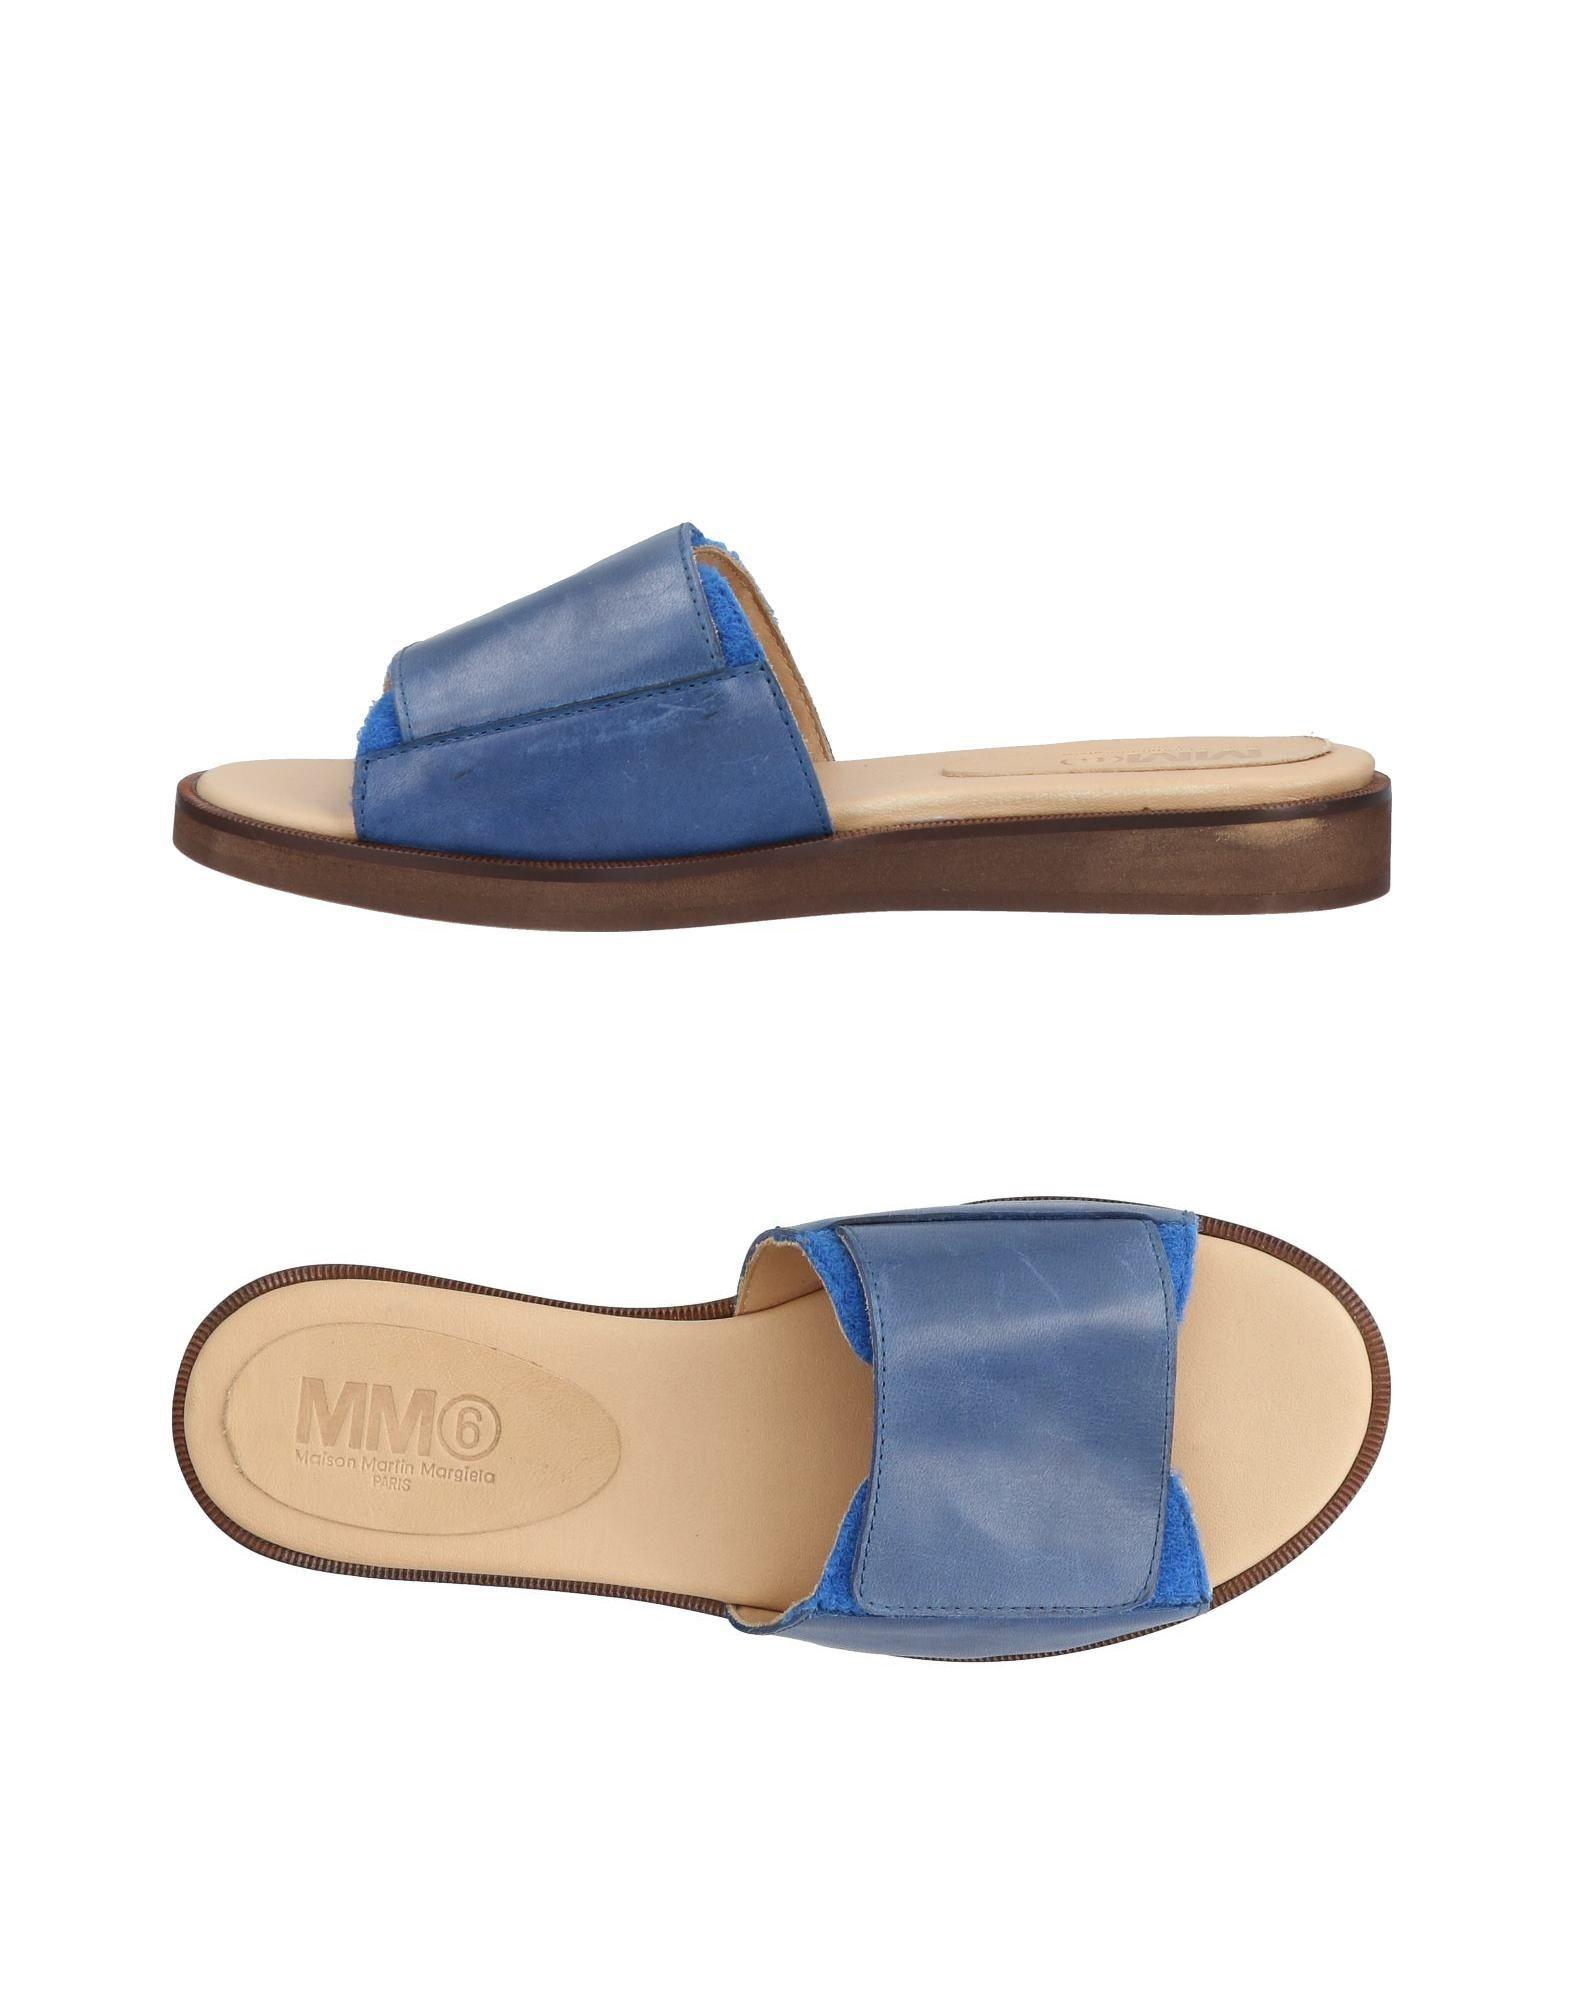 FOOTWEAR - Toe post sandals Maison Martin Margiela fZRXAF